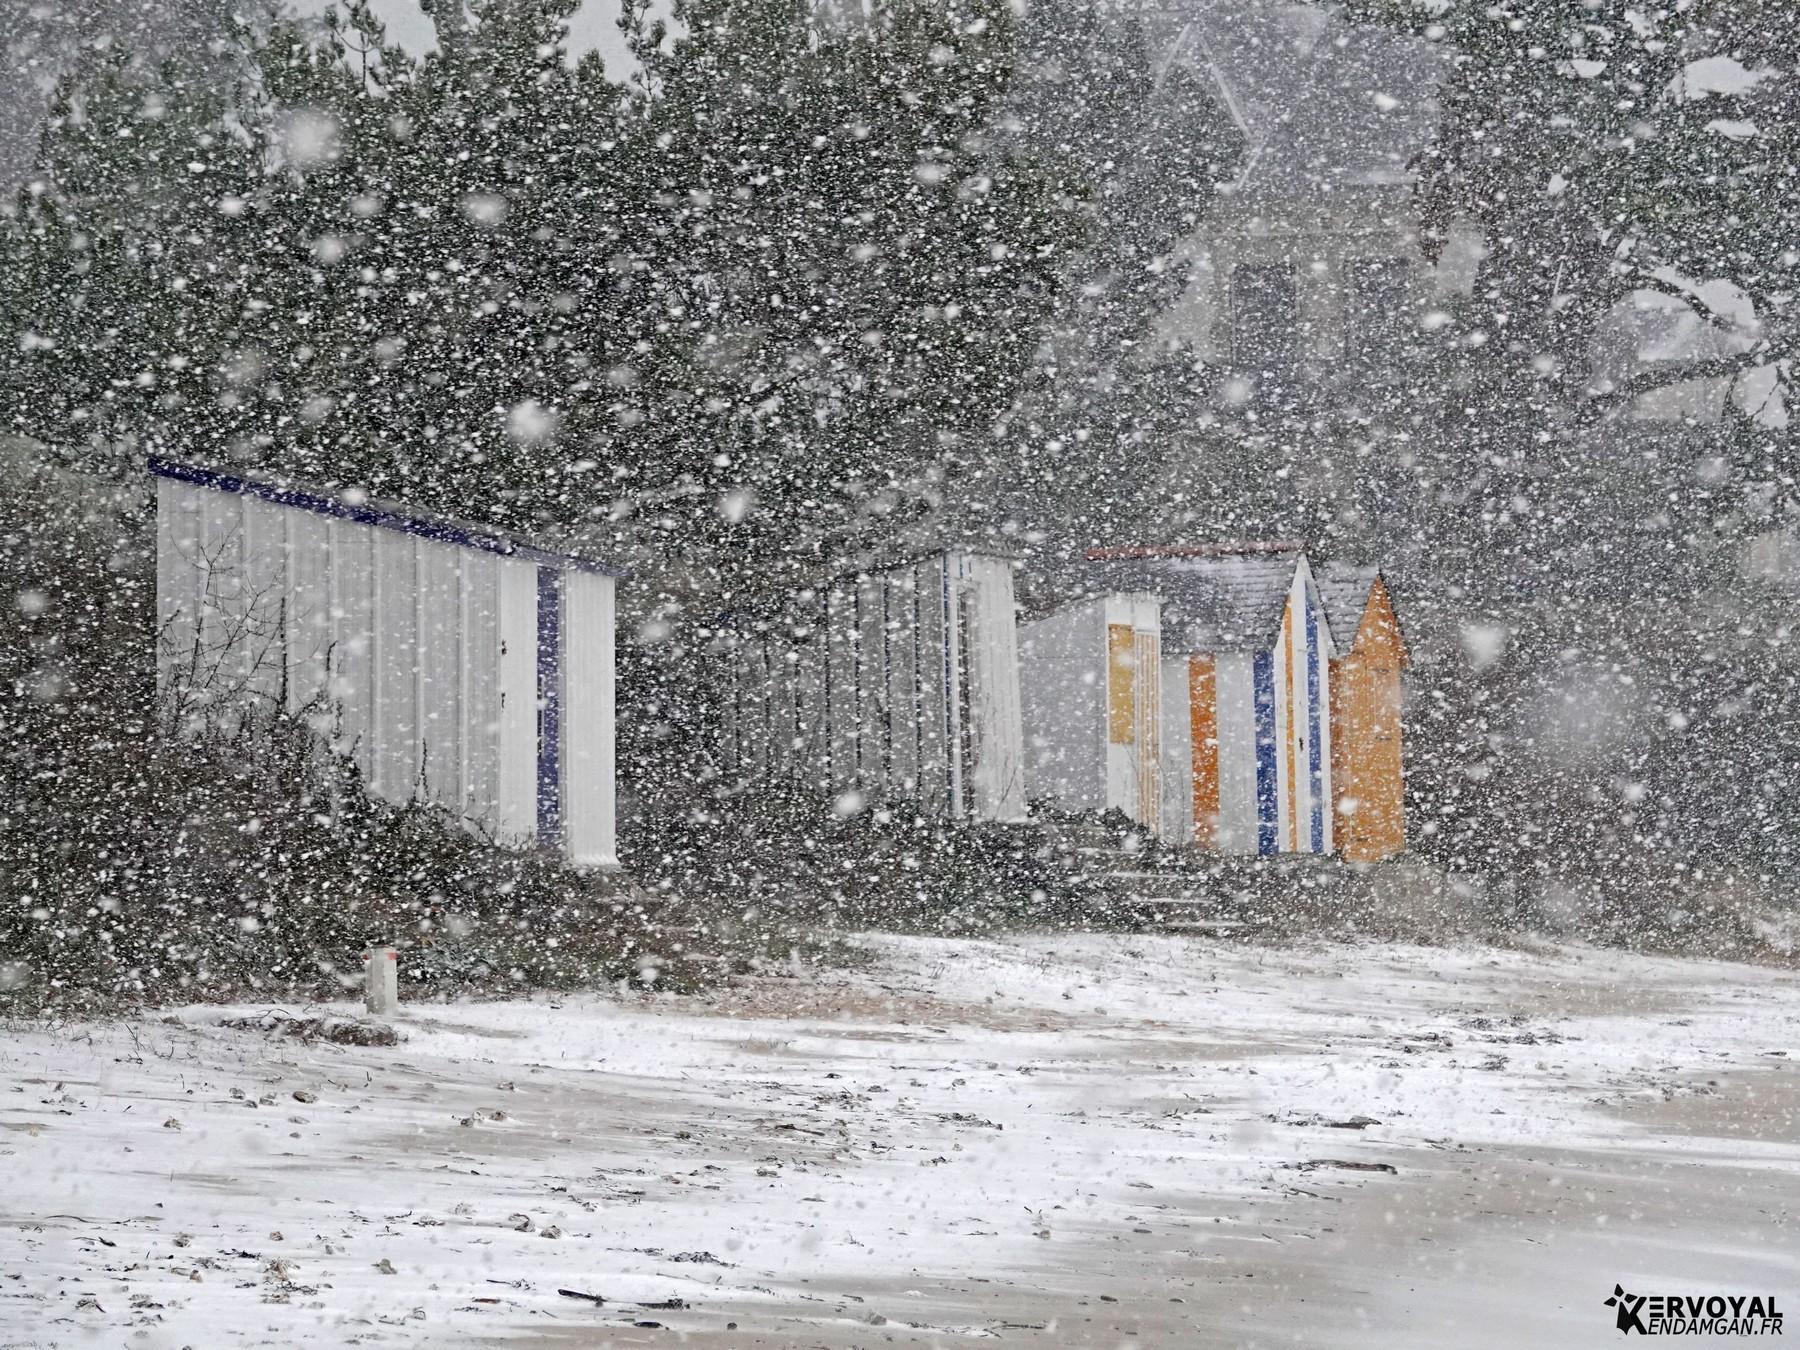 neige à kervoyal 11 février 2021 damgan morbihan (23)